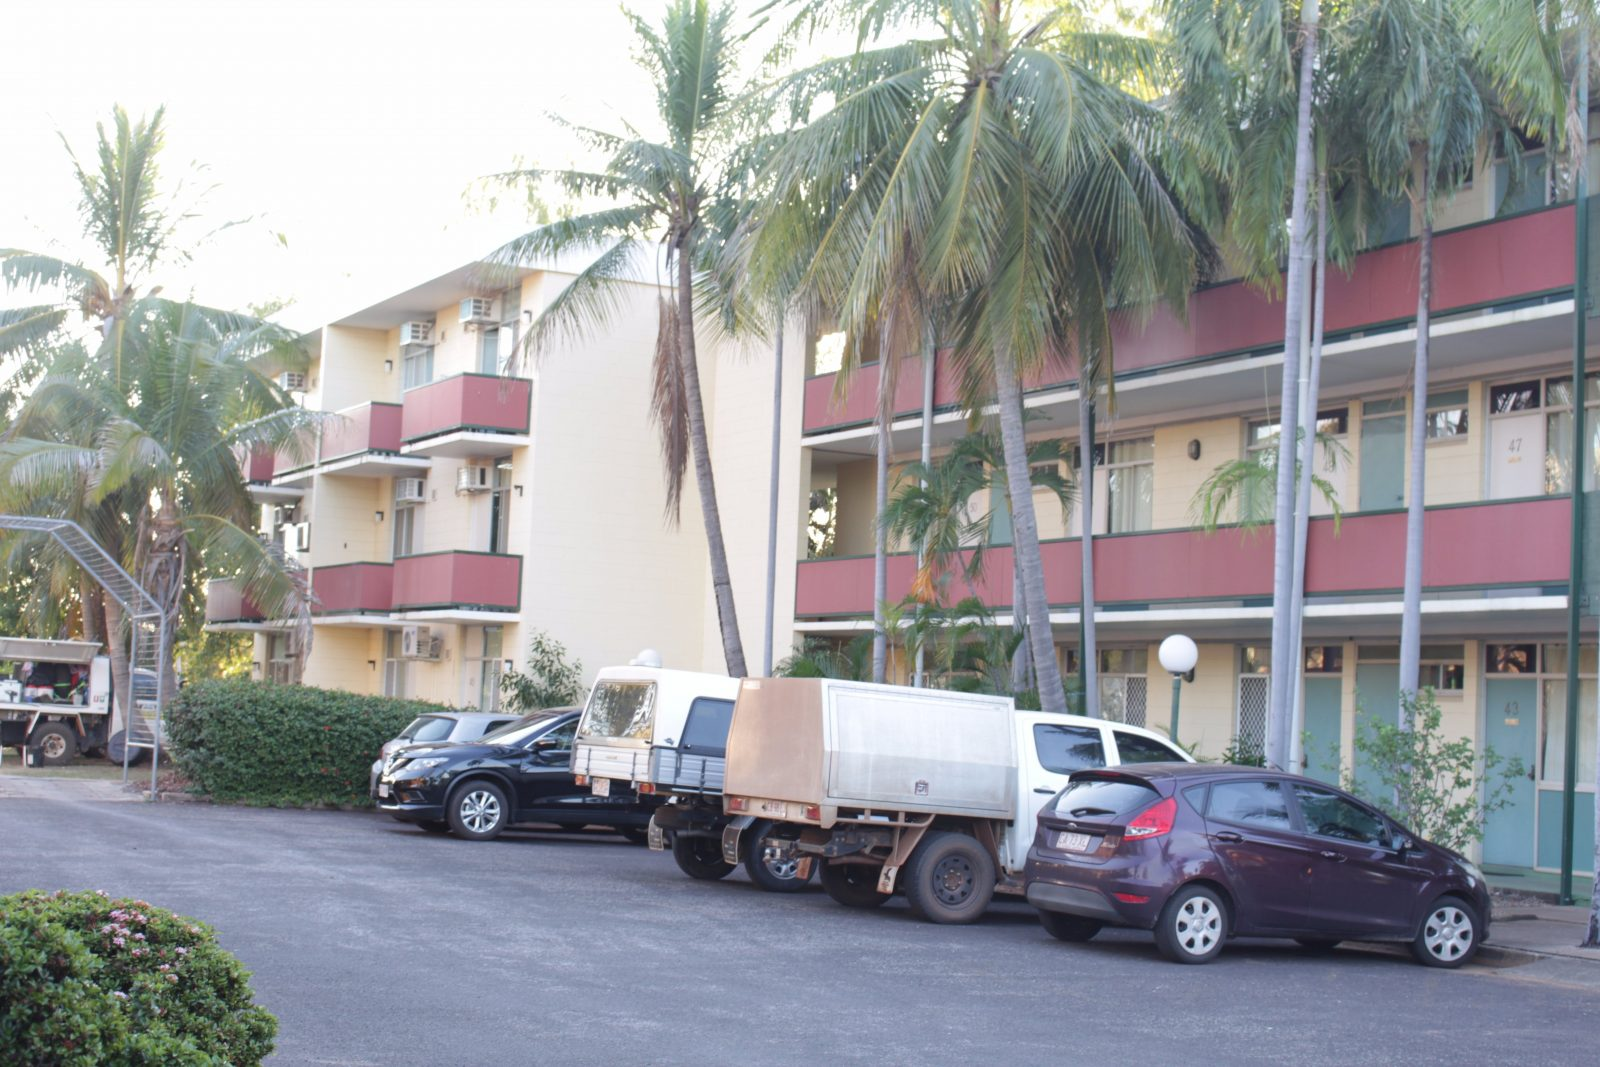 Motel_Katherine River Lodge